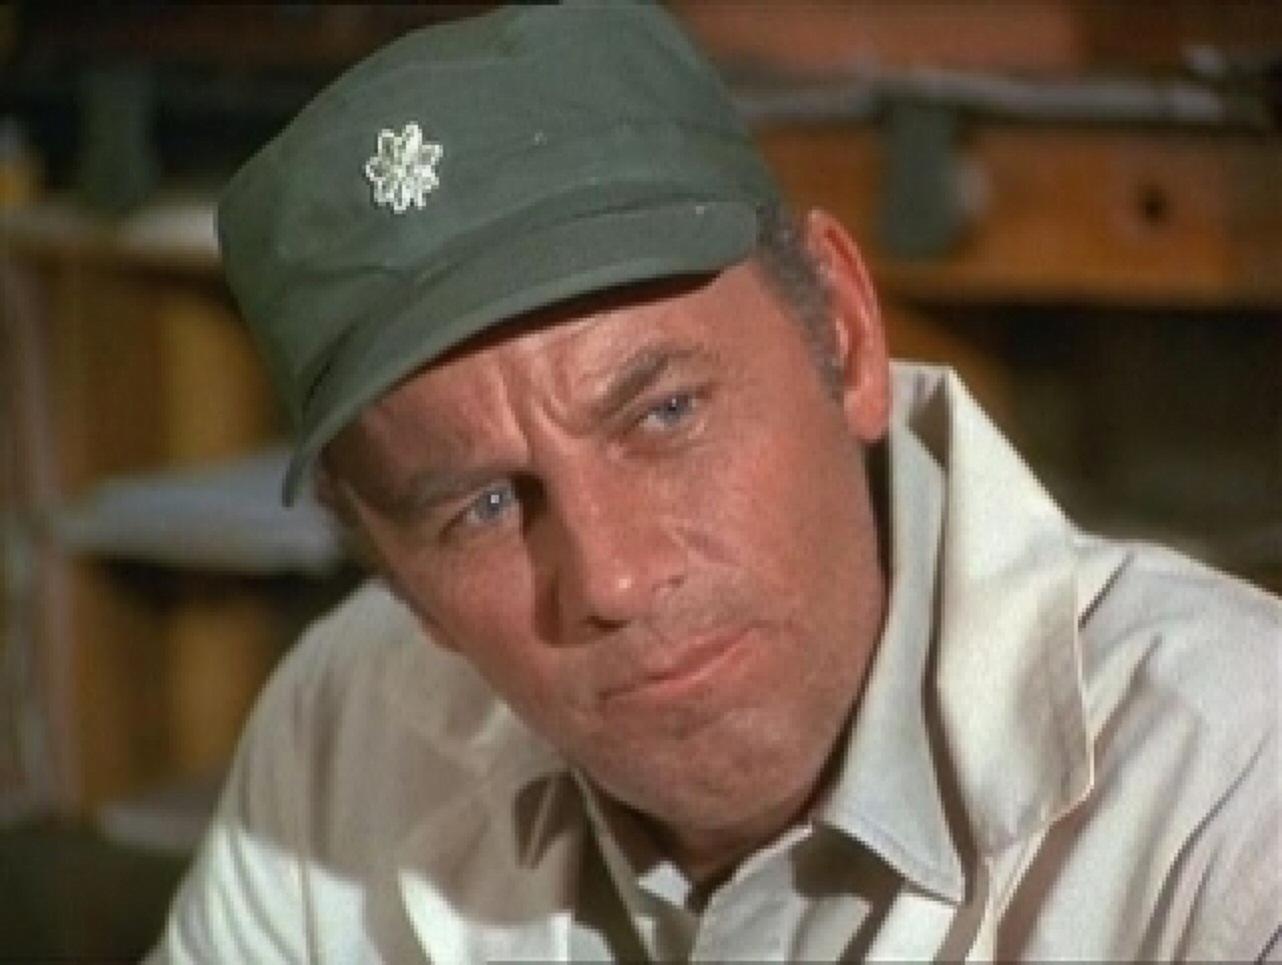 Lt. Colonel Henry Blake